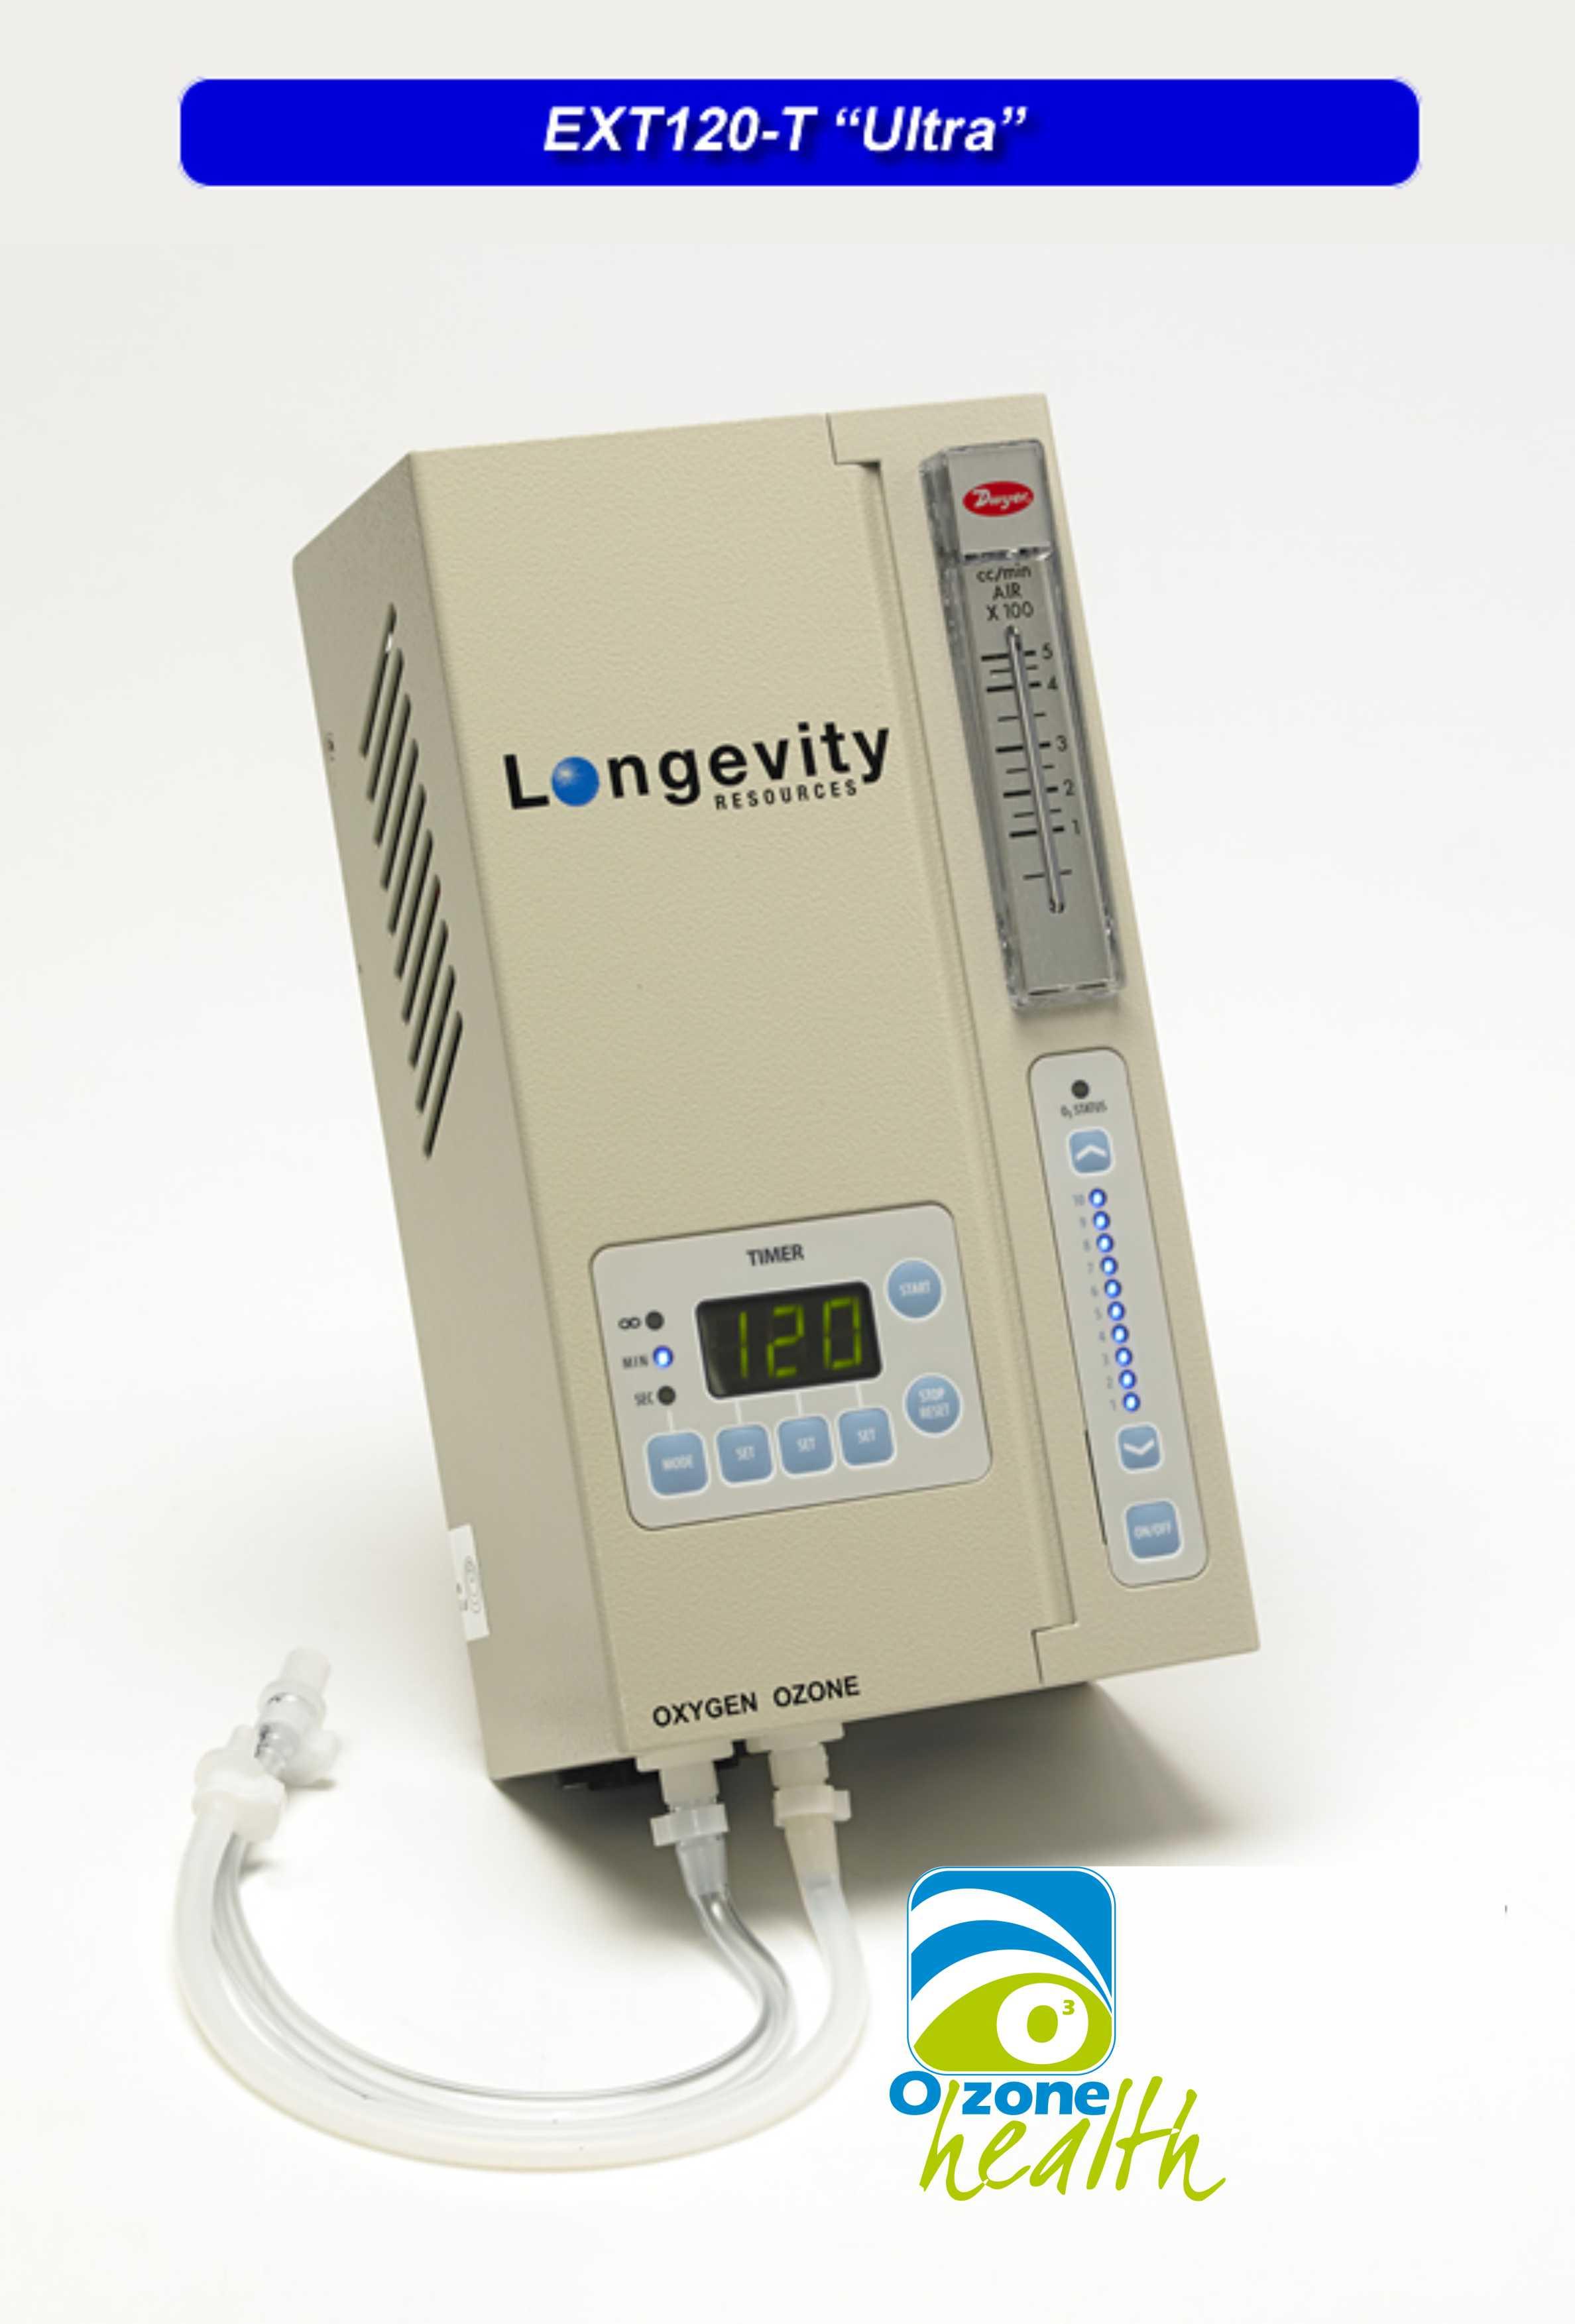 EXT120T Ultra ext120 Ozone Generators – Medical Ozone – EXT120T ULTRA EXT120T Ultra 2